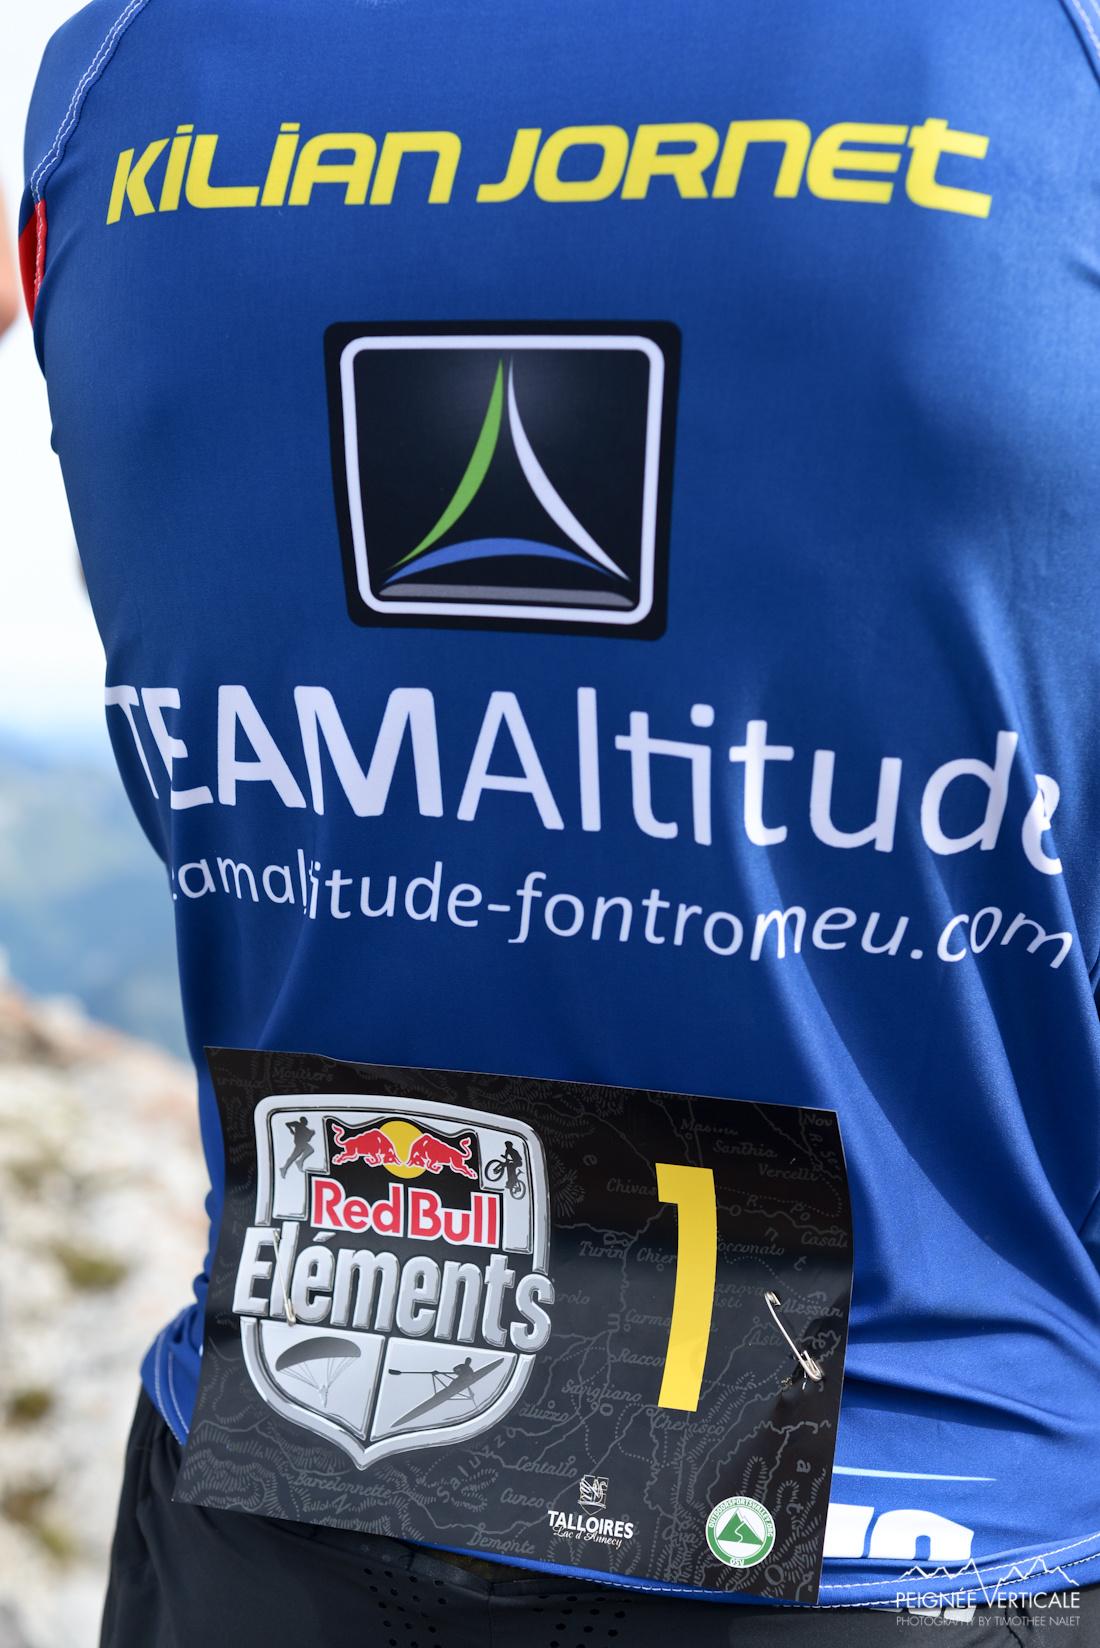 Red-Bull-Elements-2013-Annecy-Timothée-Nalet-0283.jpg